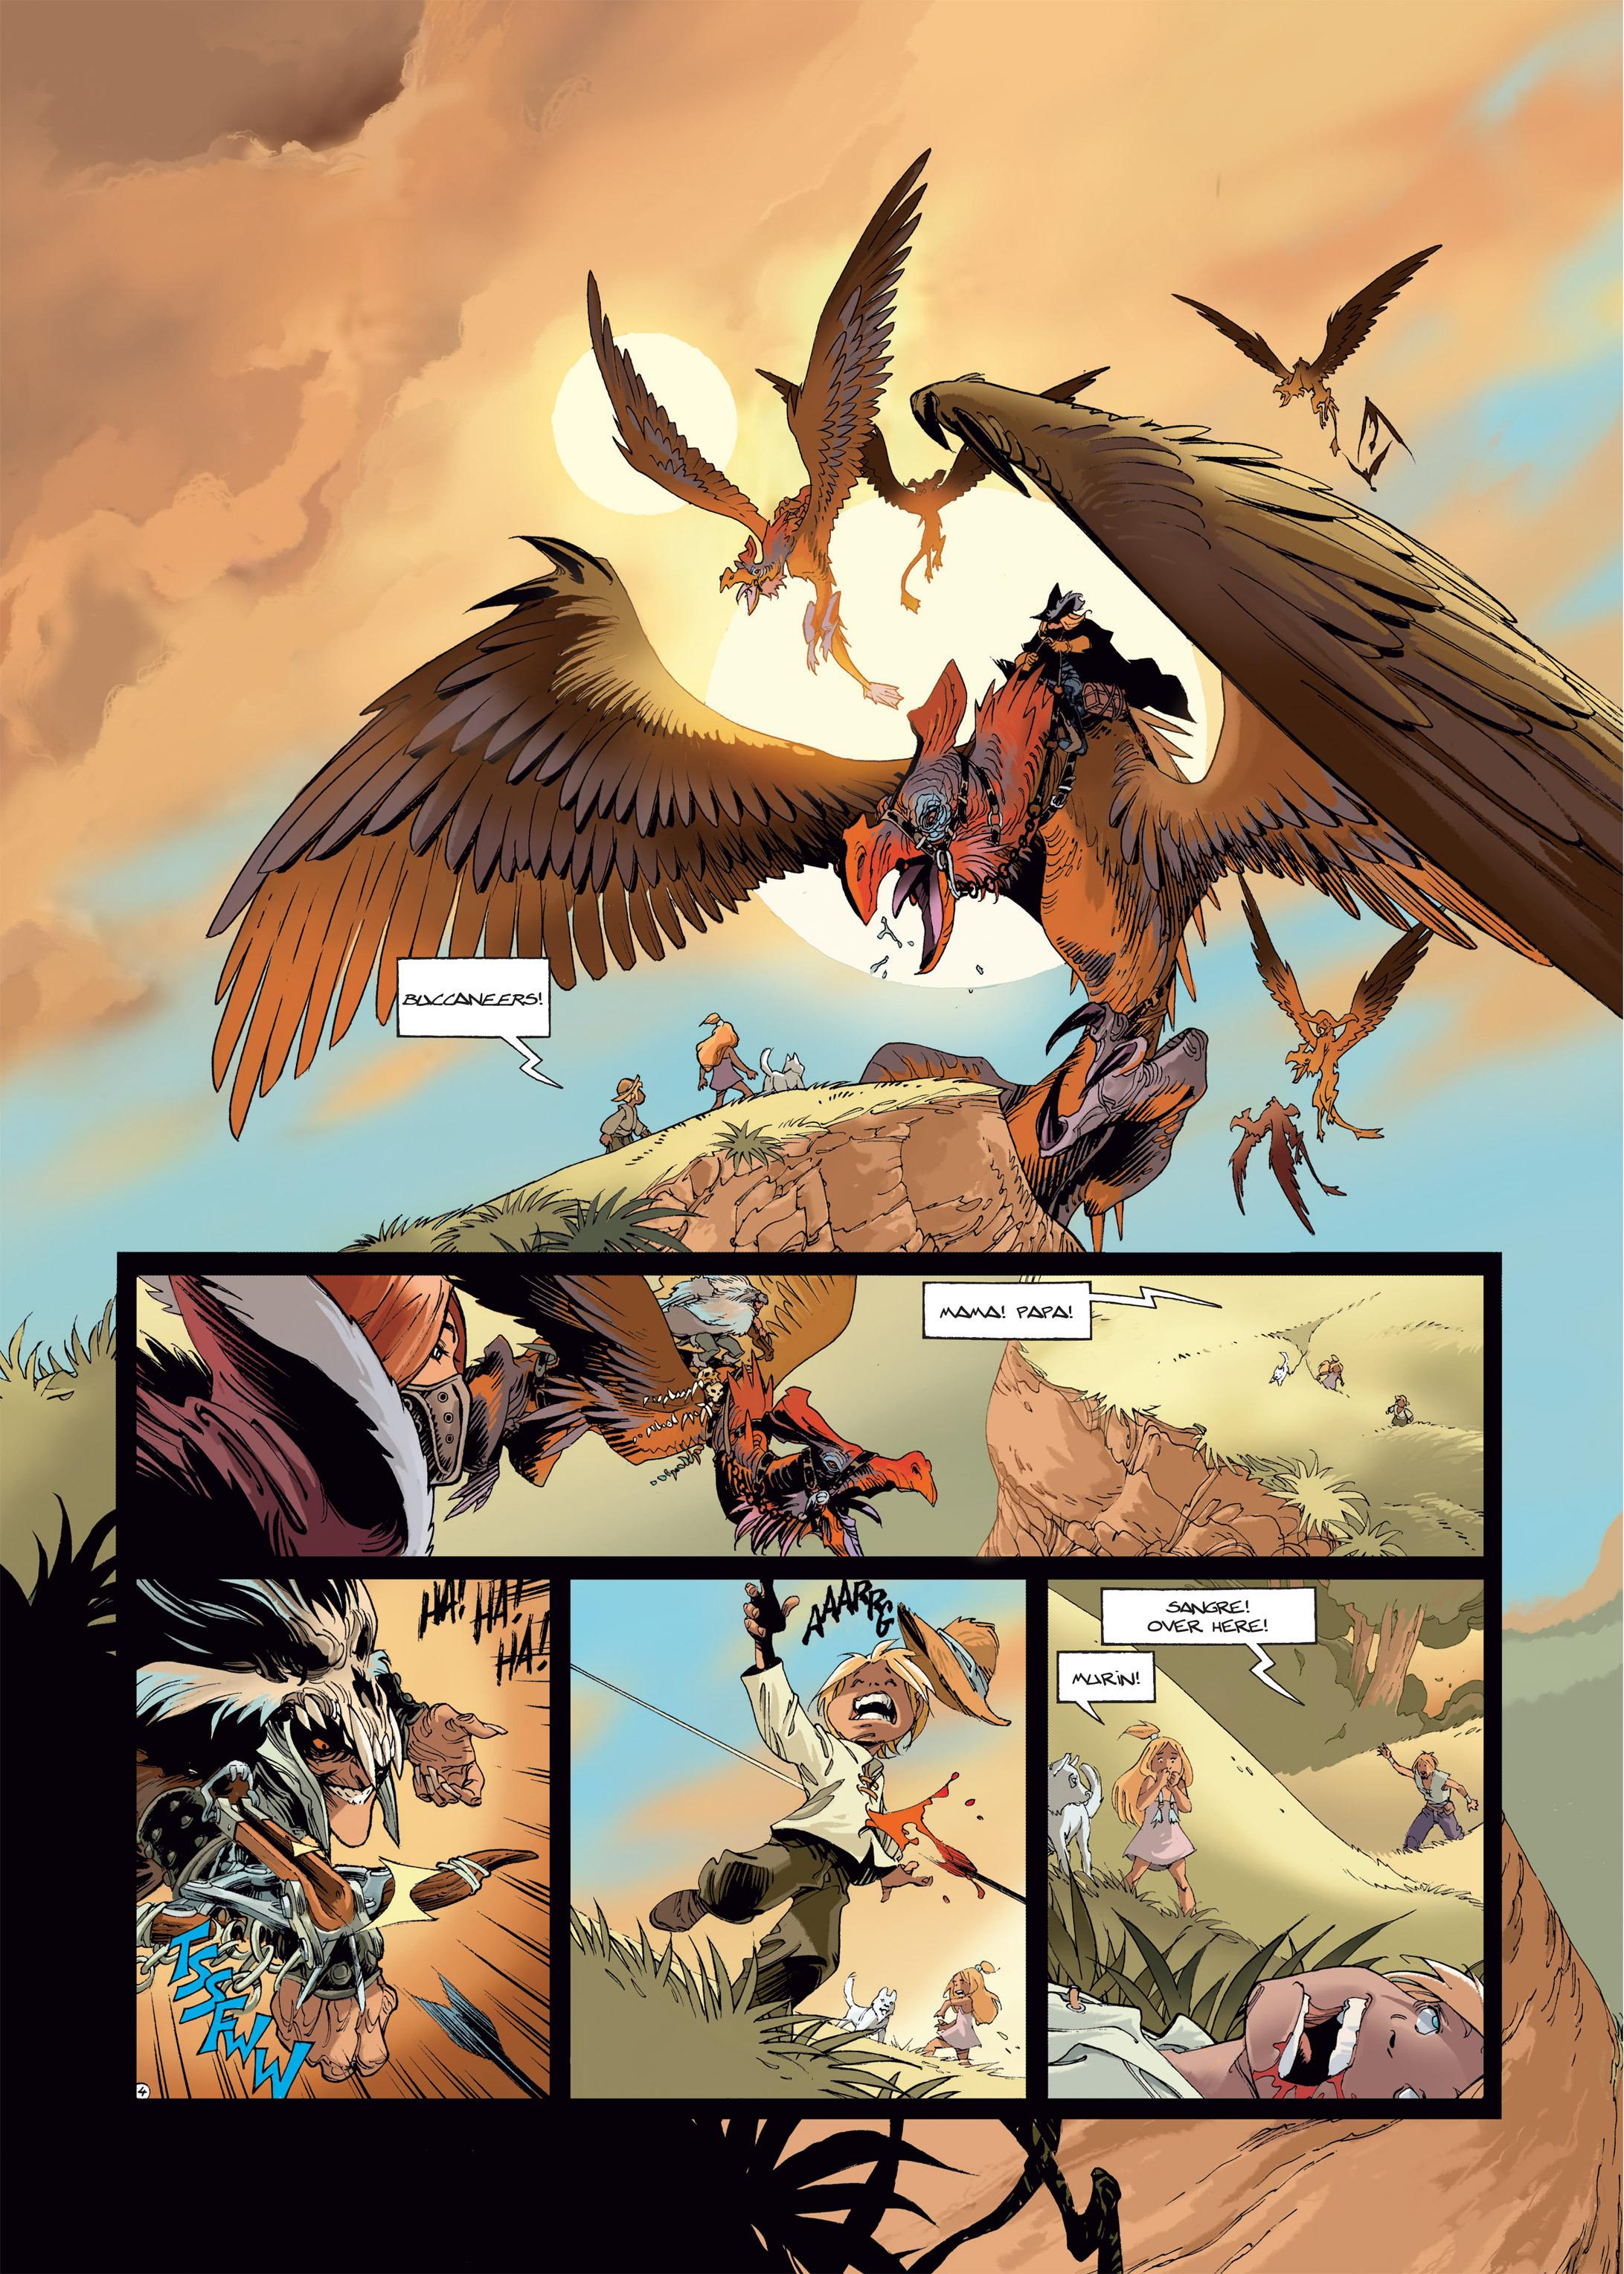 Read online Sangre Vol. 1: Sangre the Survivor comic -  Issue # Full - 6